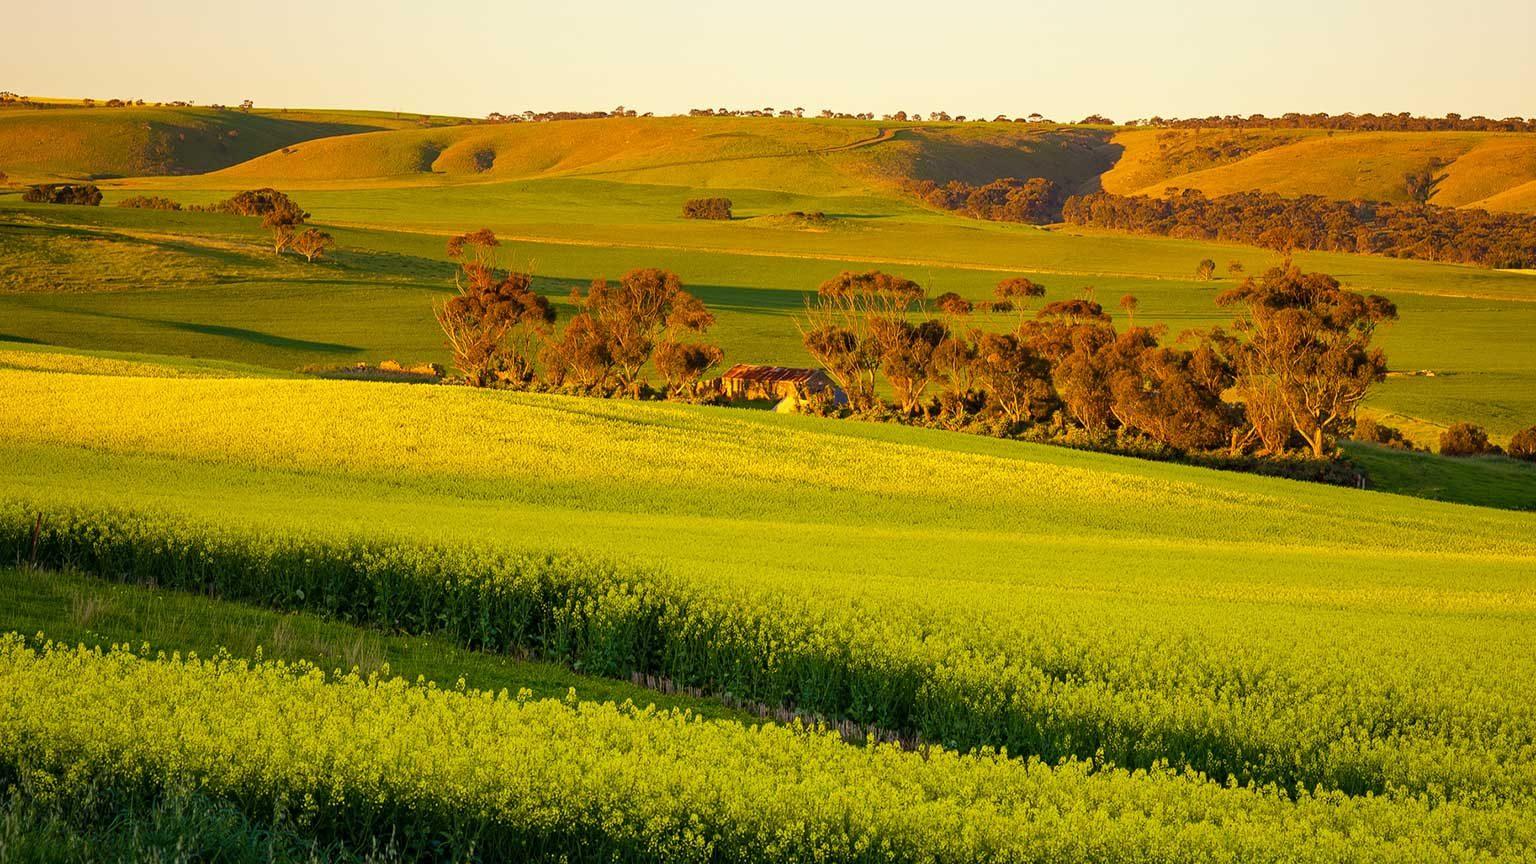 Canola fields in Adelaide.